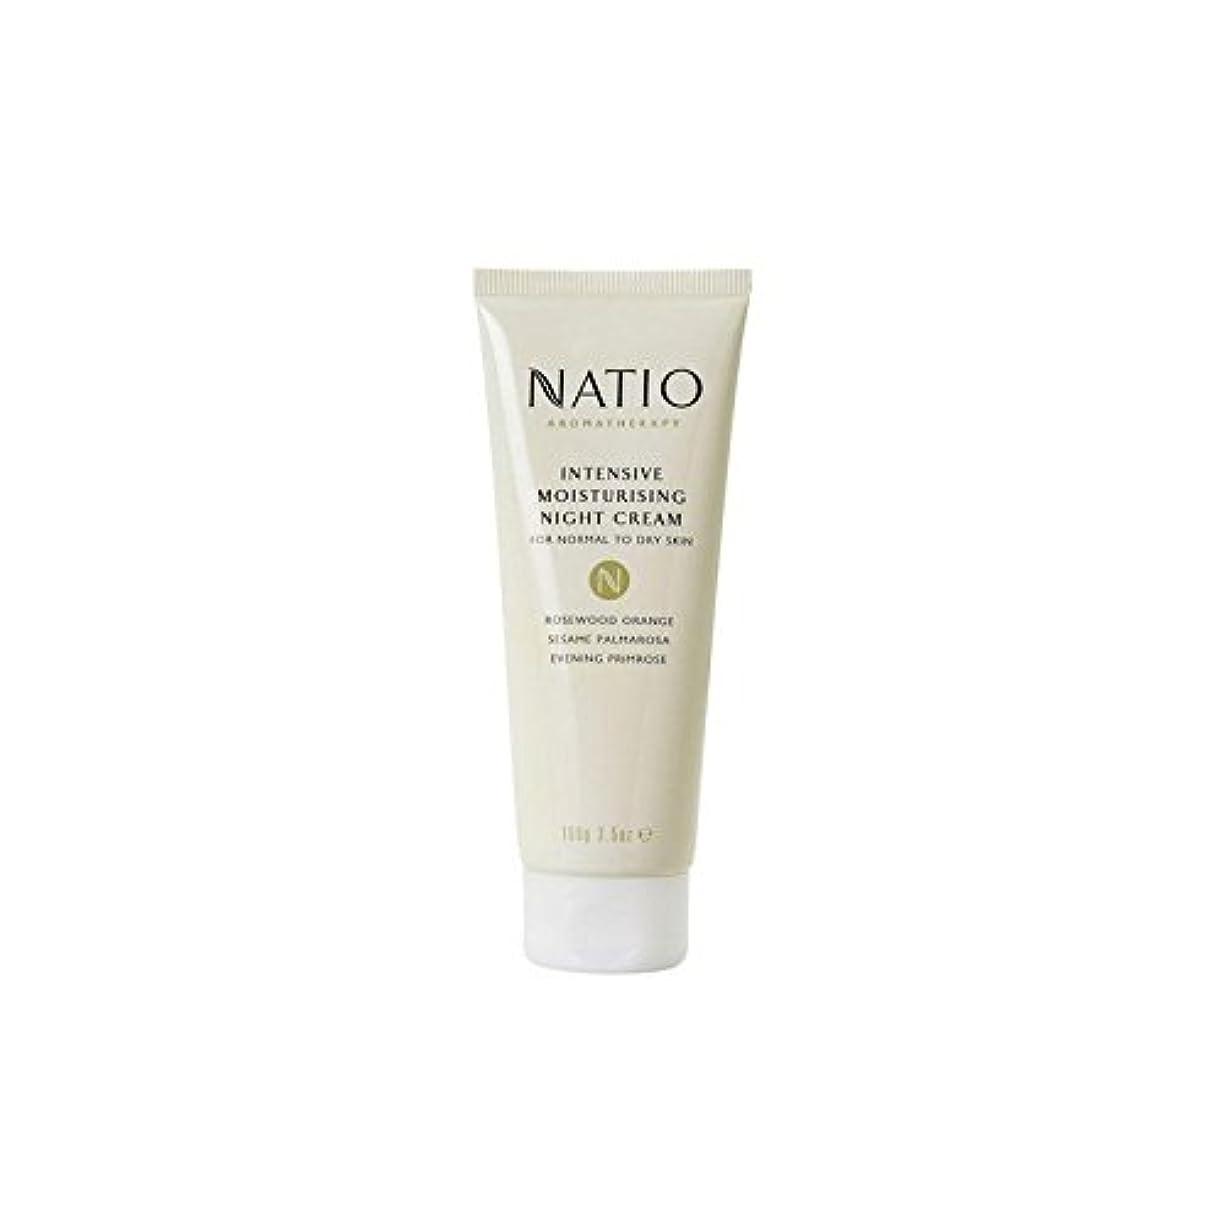 Natio Intensive Moisturising Night Cream (100G) (Pack of 6) - 集中的な保湿ナイトクリーム(100グラム) x6 [並行輸入品]